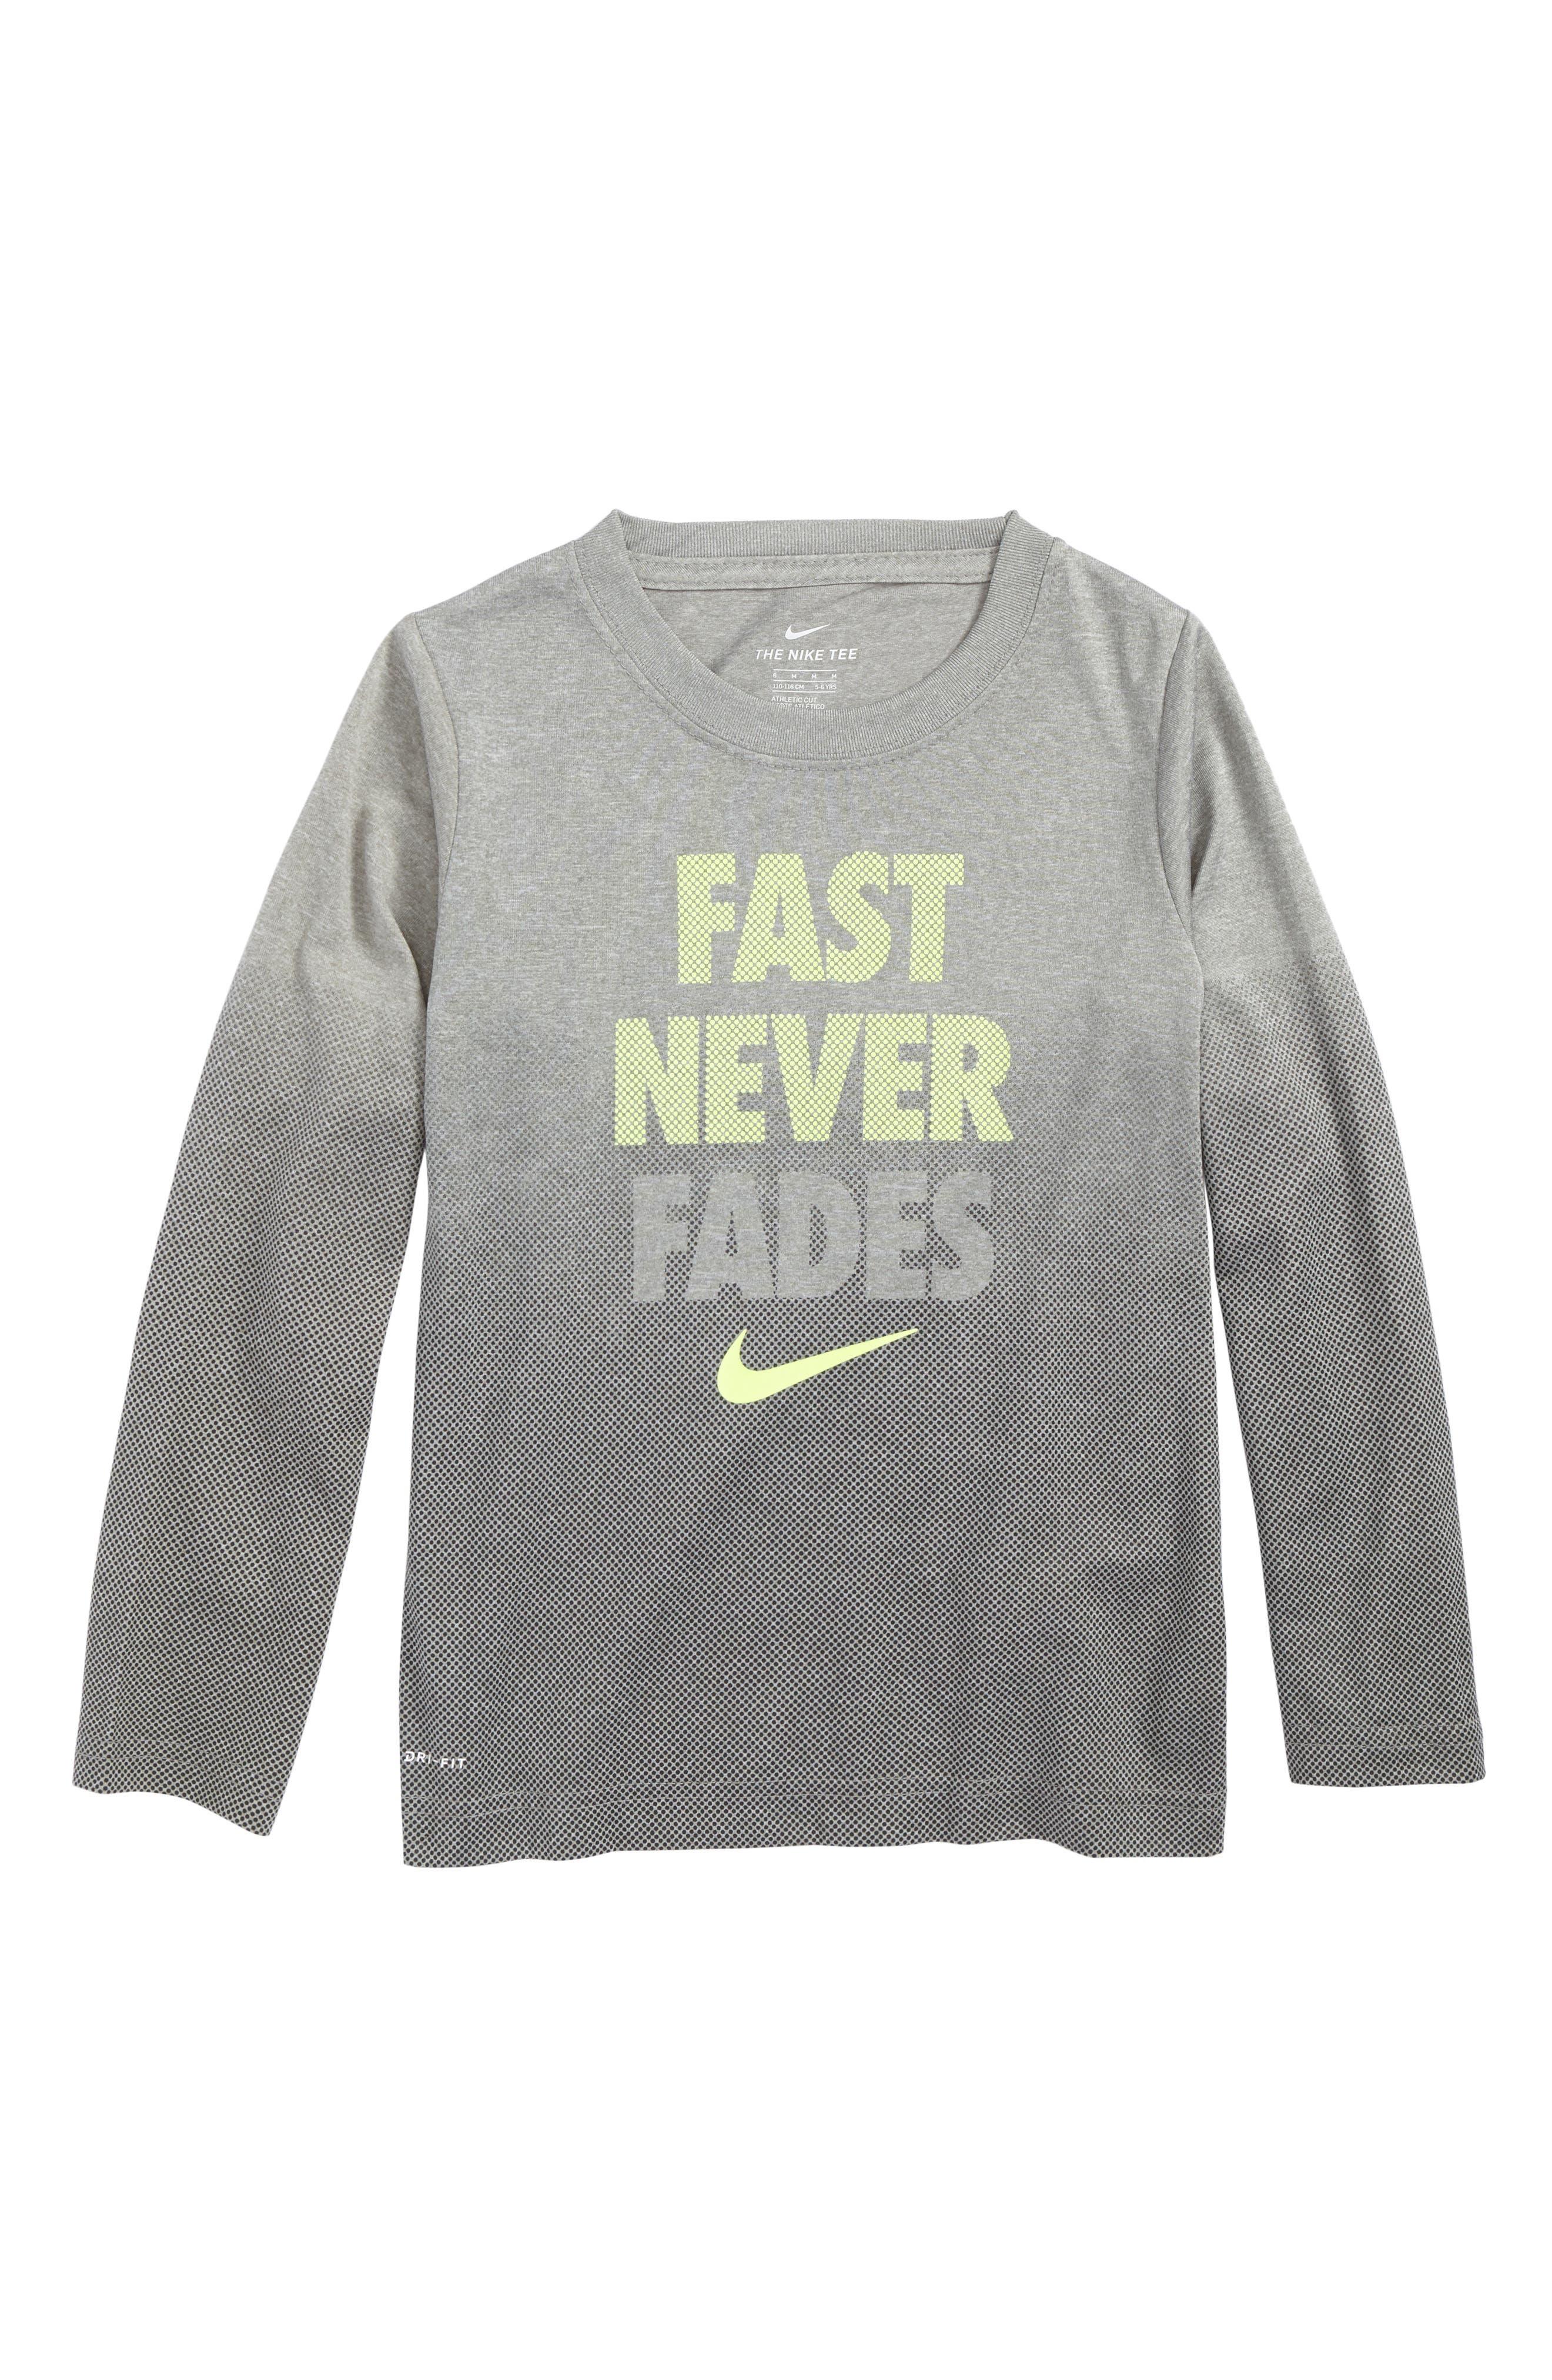 Nike Fast Never Fades Long Sleeve T-Shirt (Toddler Boys & Little Boys)